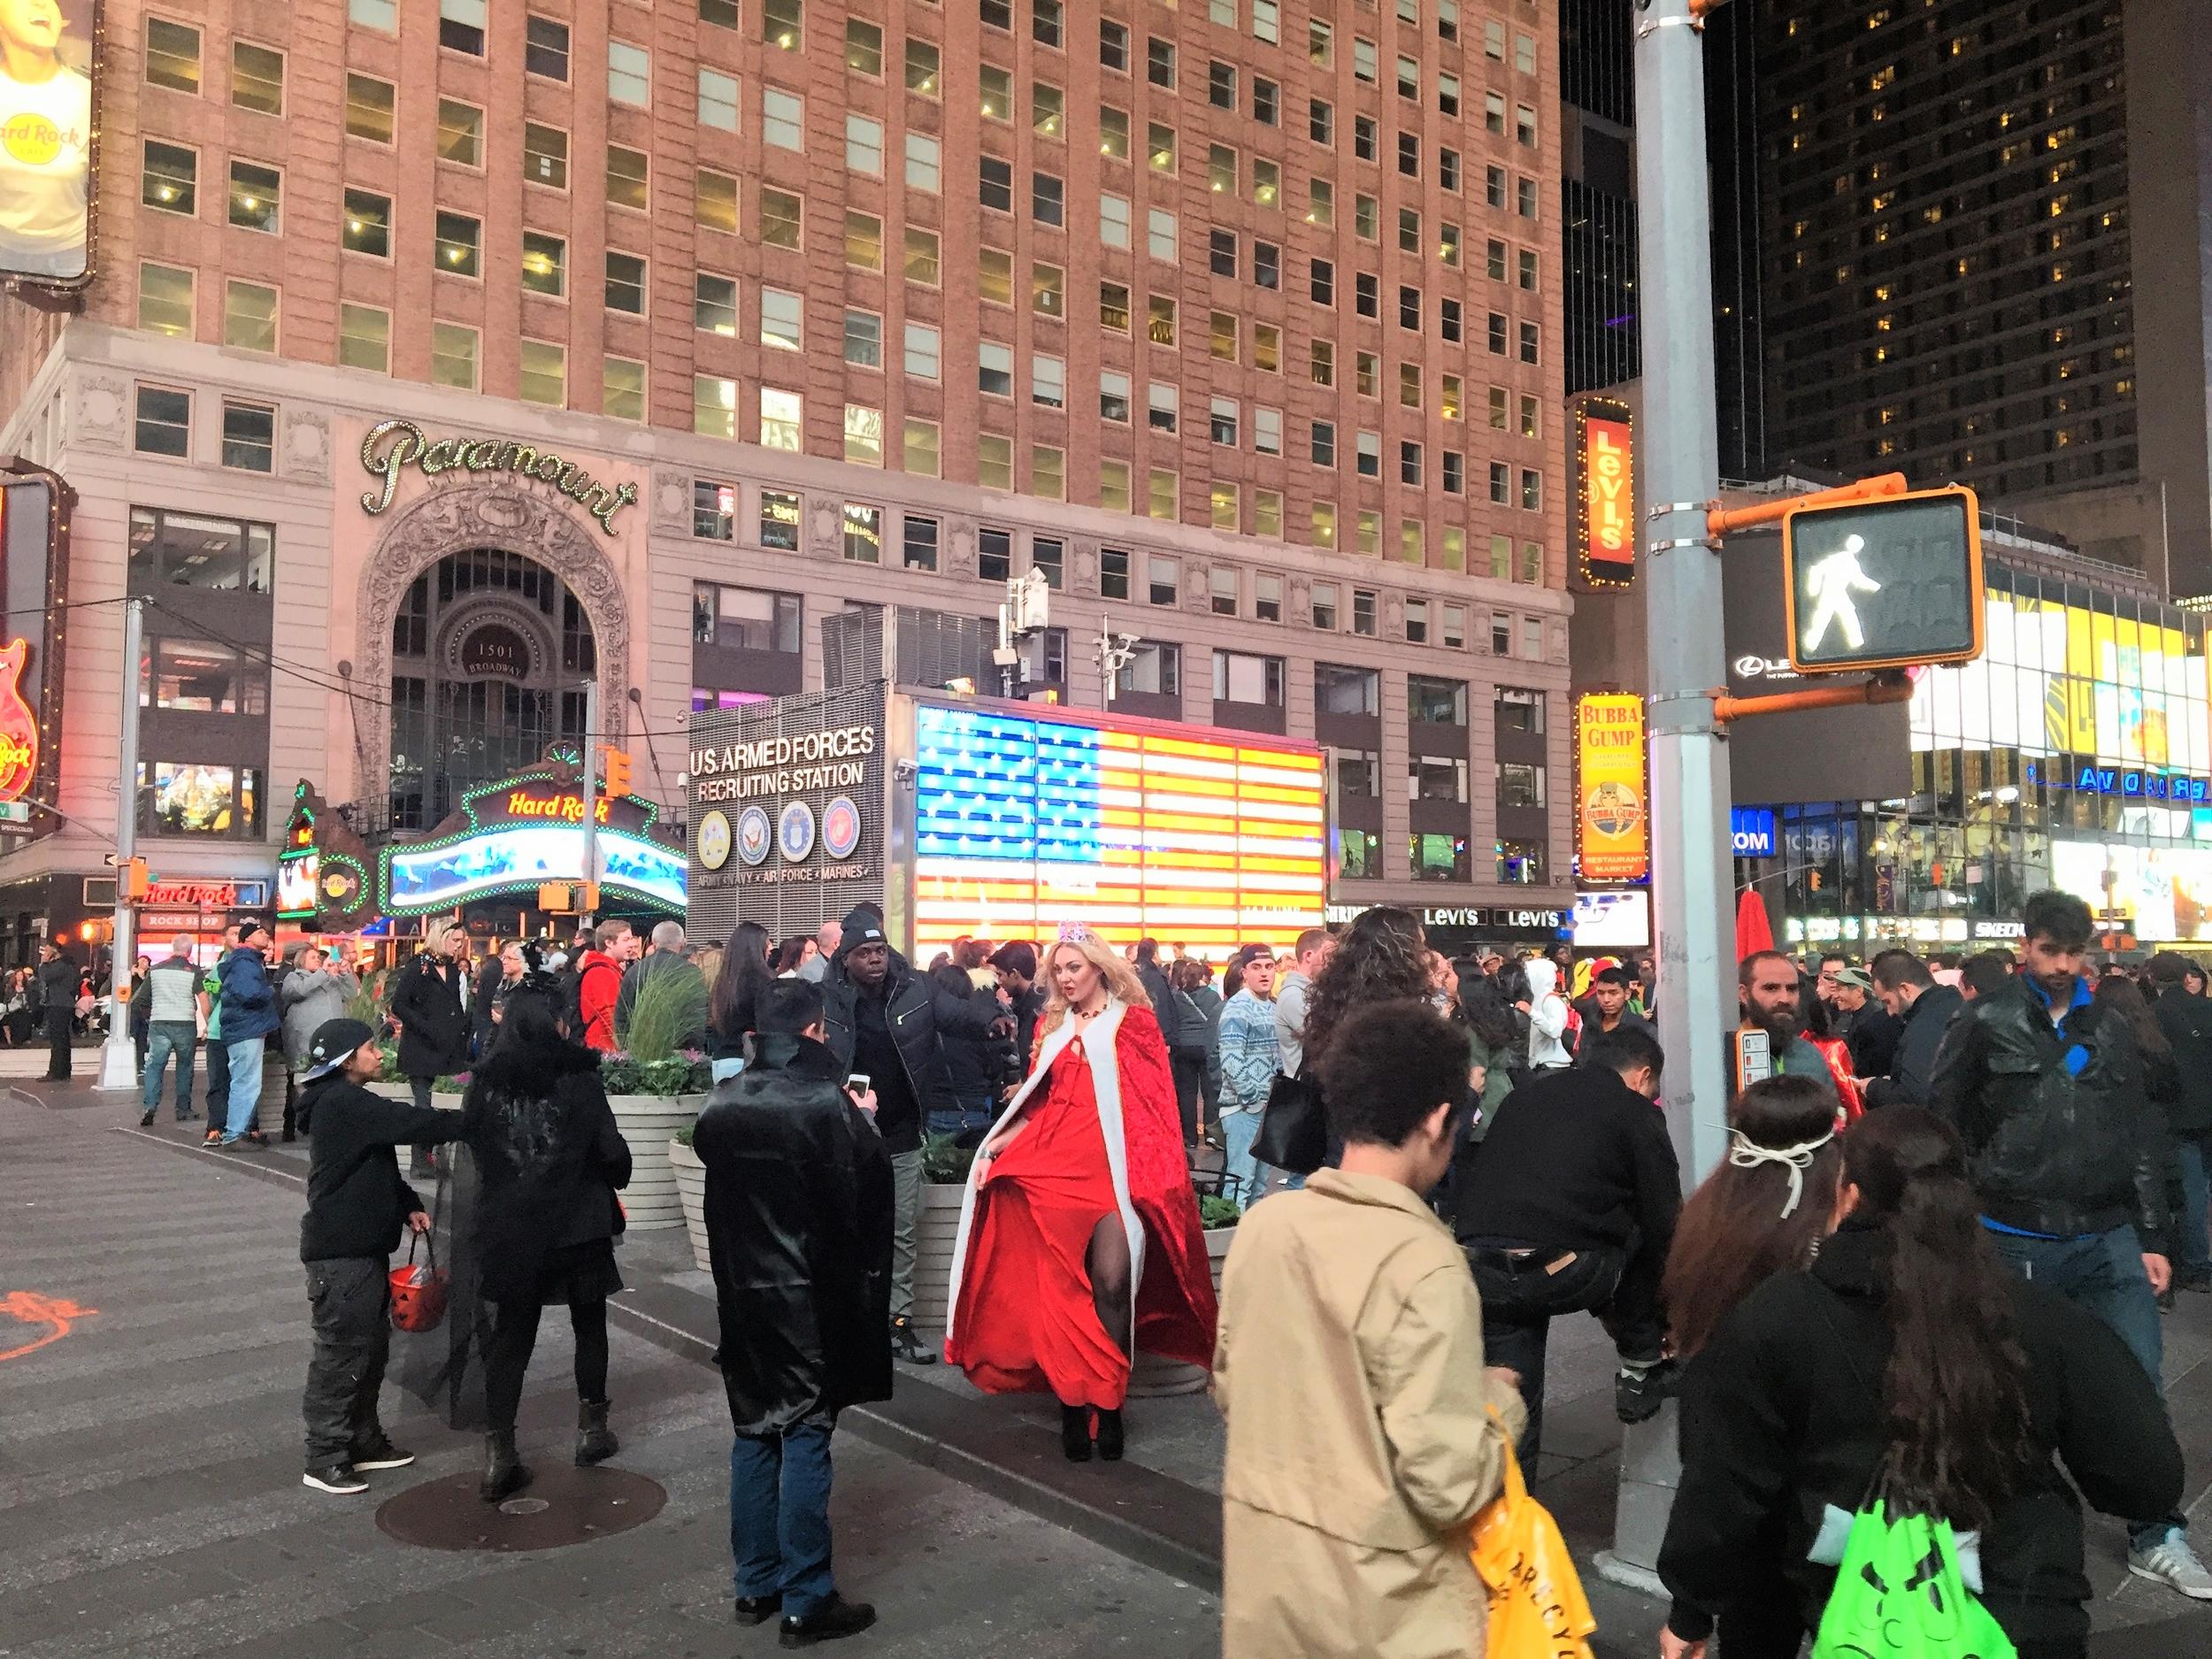 NYC by night...